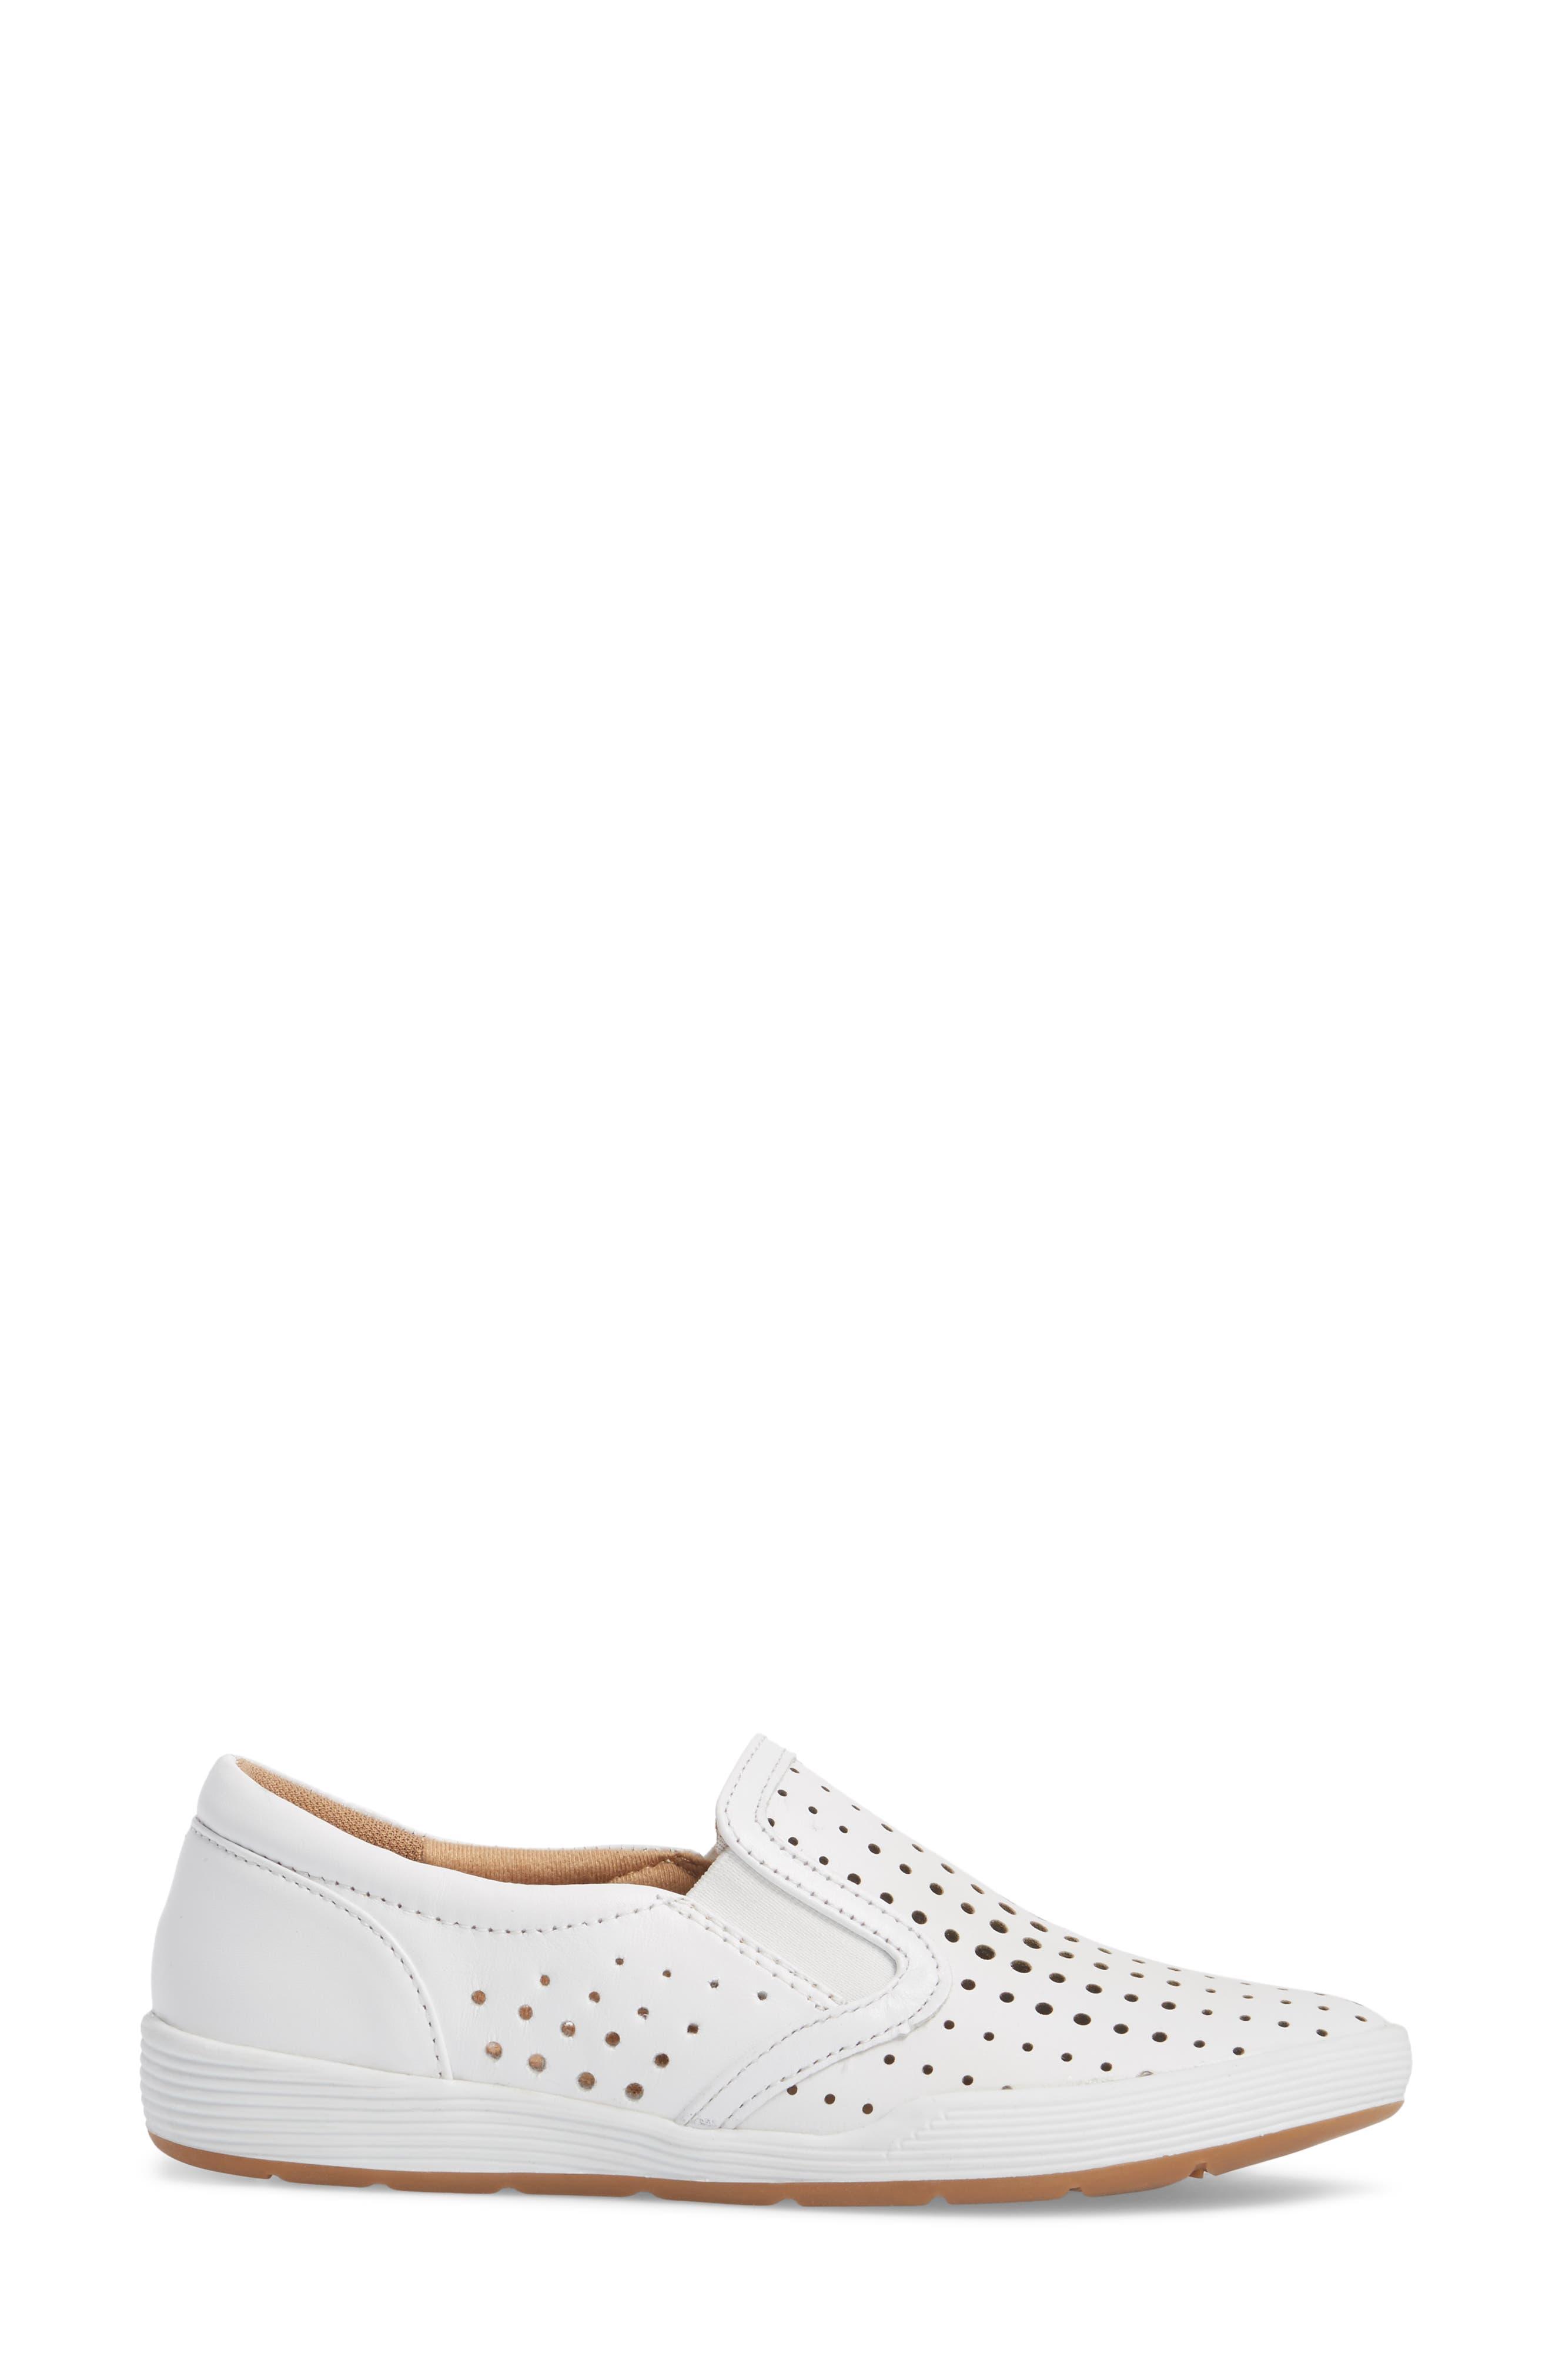 Lyra Perforated Slip-On Sneaker,                             Alternate thumbnail 3, color,                             White Leather